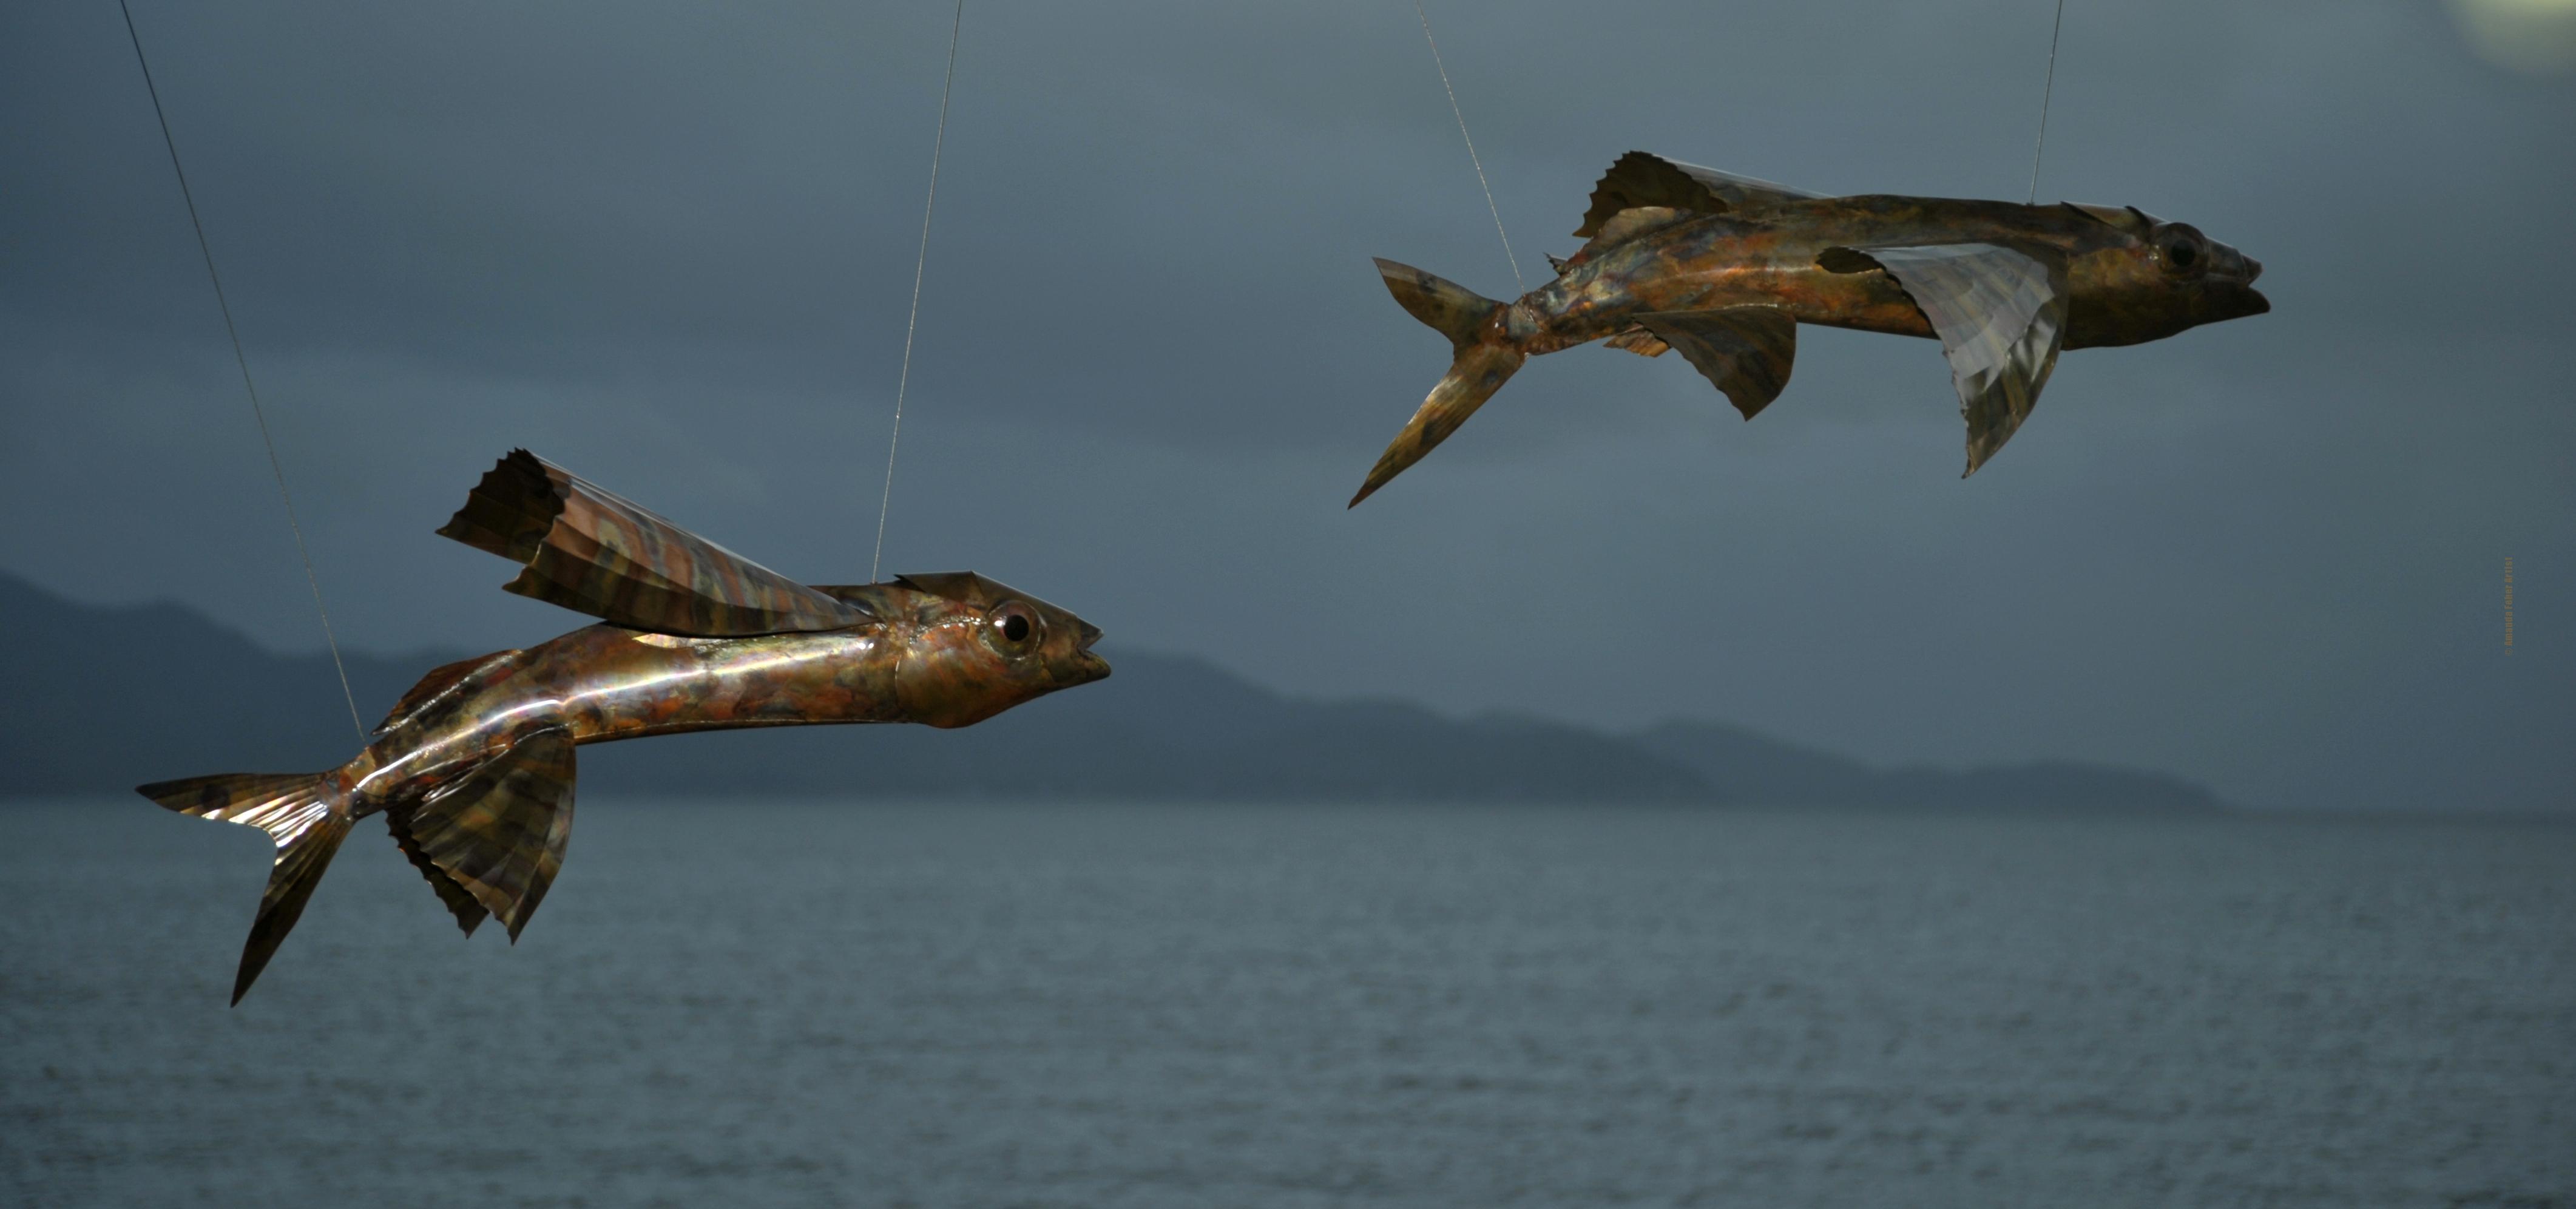 Flight school for The flying fish